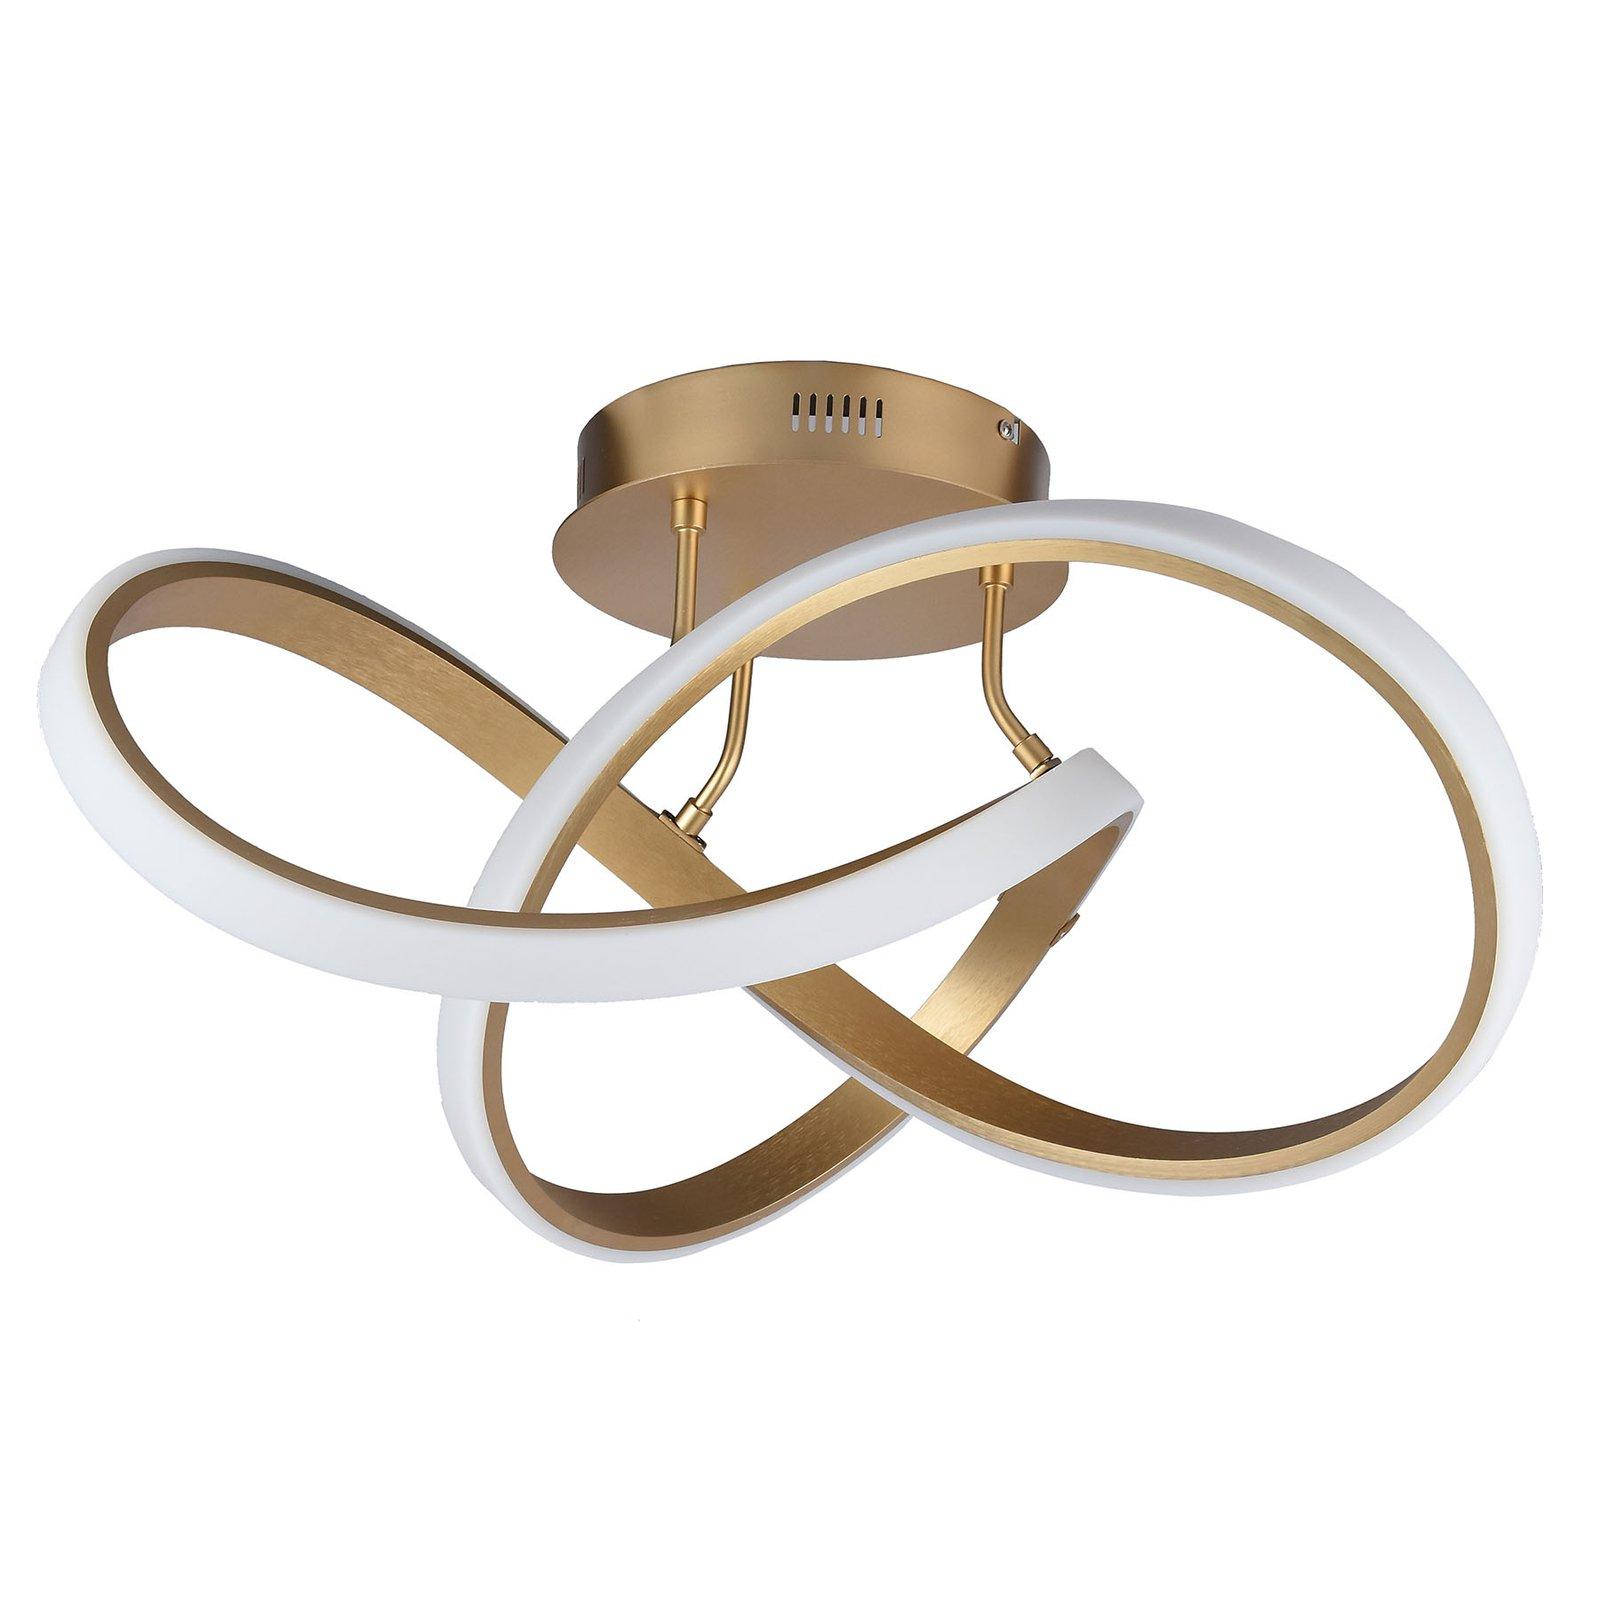 LED-taklampe Indigo, 1 lyskilde, gull matt